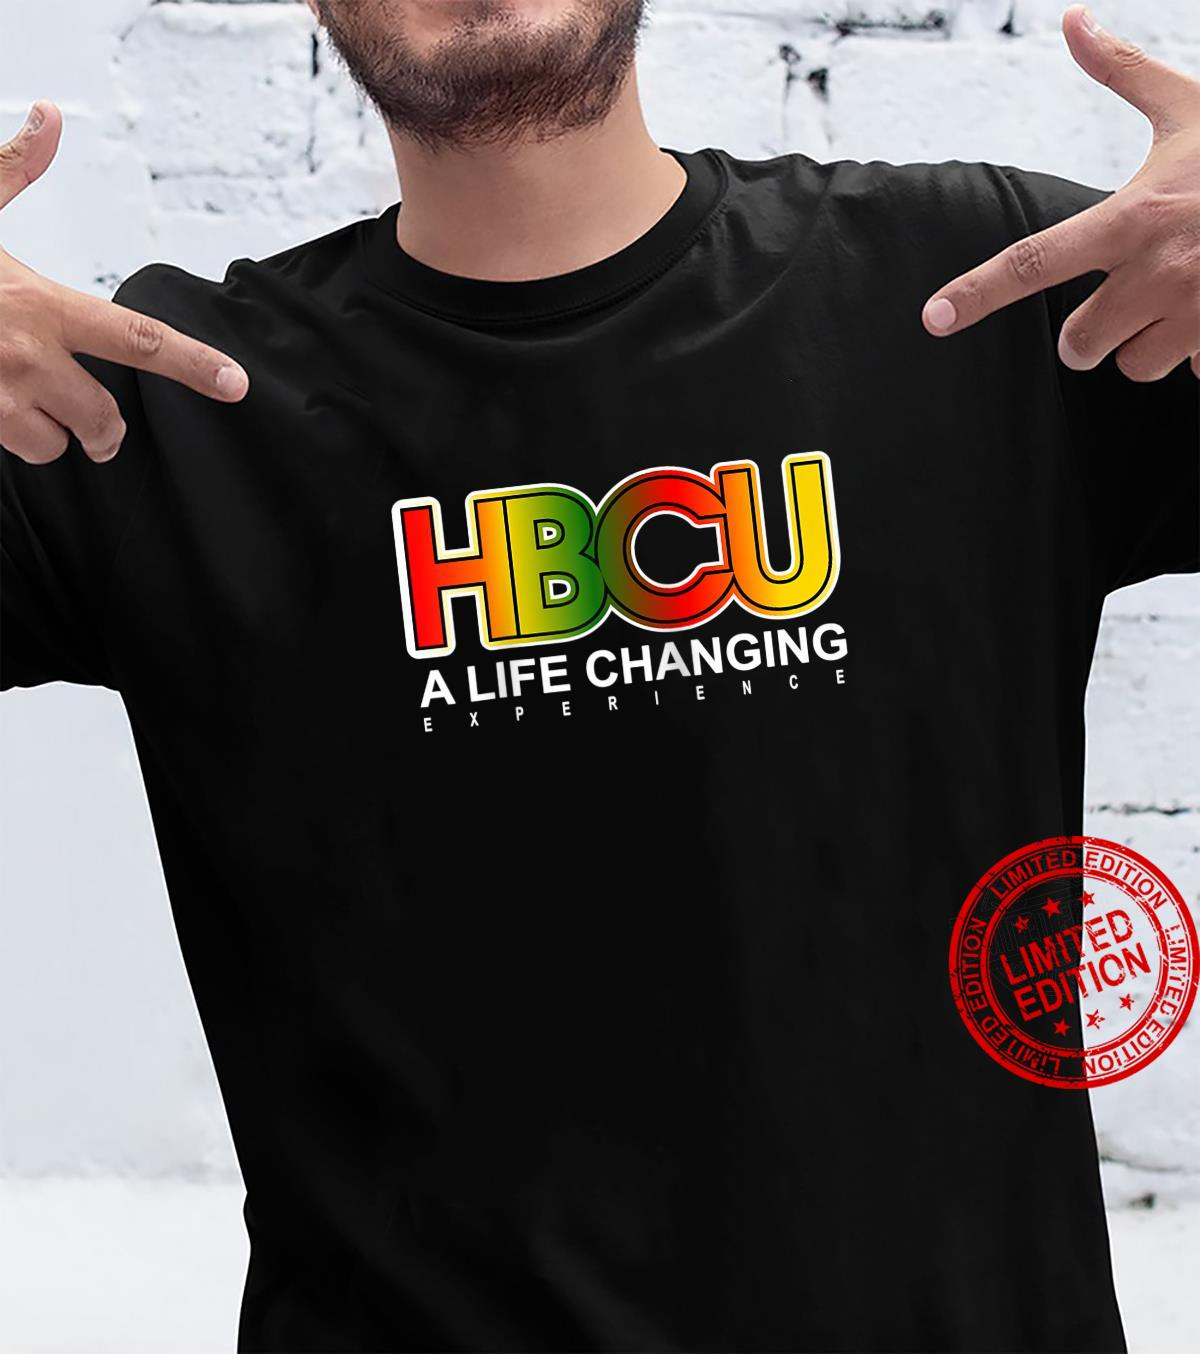 HBCU LIFE CHANGING EXPERIENCE Shirt